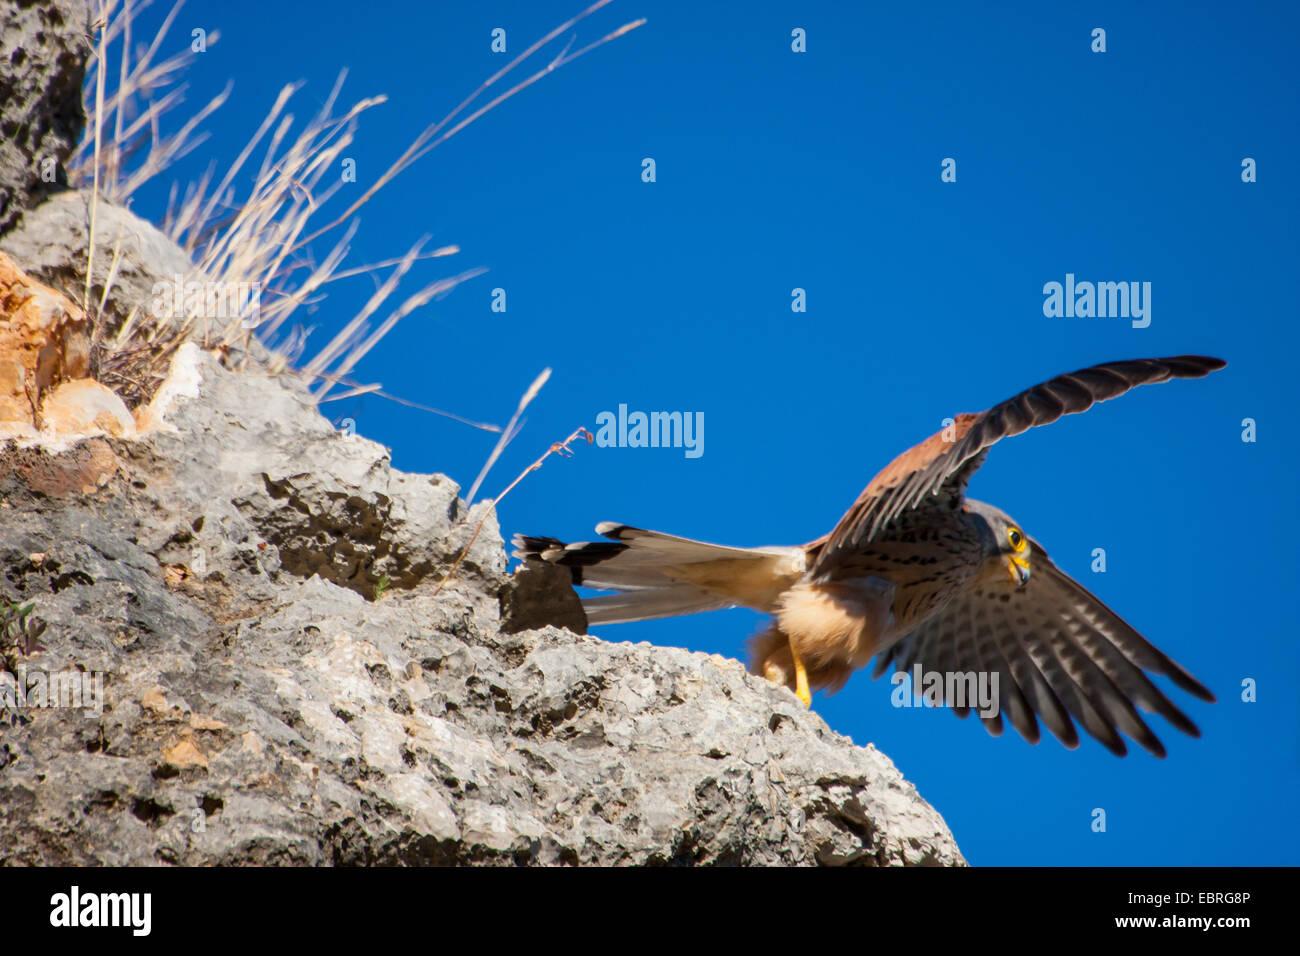 European Kestrel, Eurasian Kestrel, Old World Kestrel, Common Kestrel (Falco tinnunculus), taking off a ledge, Spain, - Stock Image